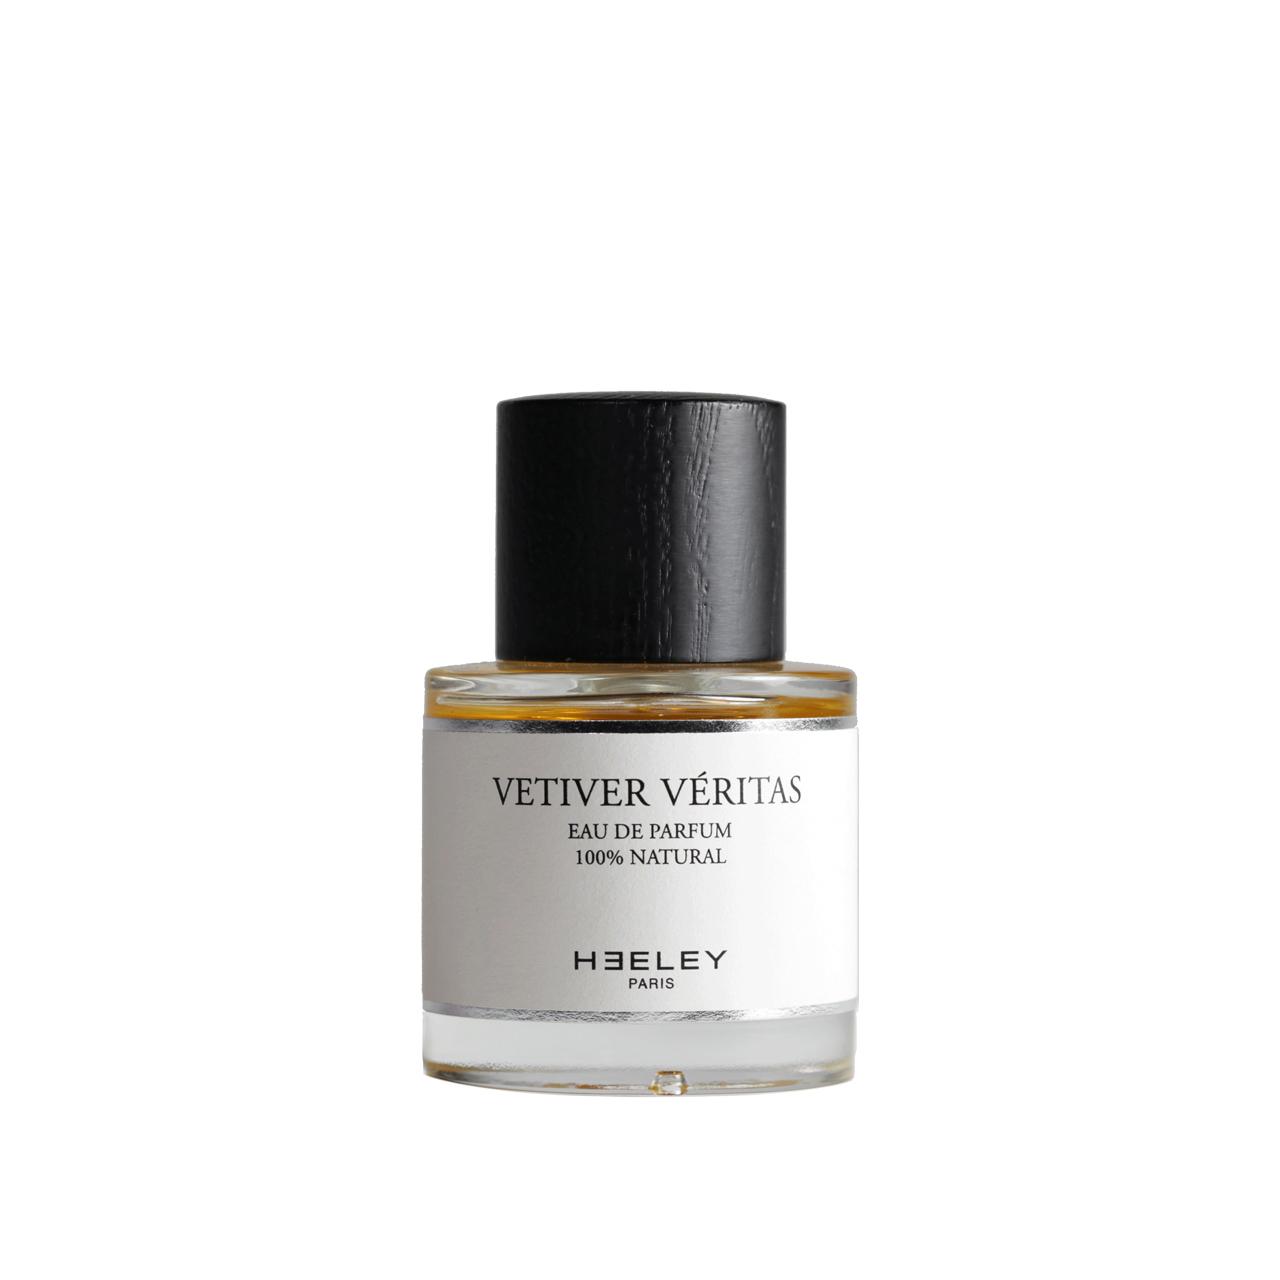 Vetiver Veritas - Eau de Parfum